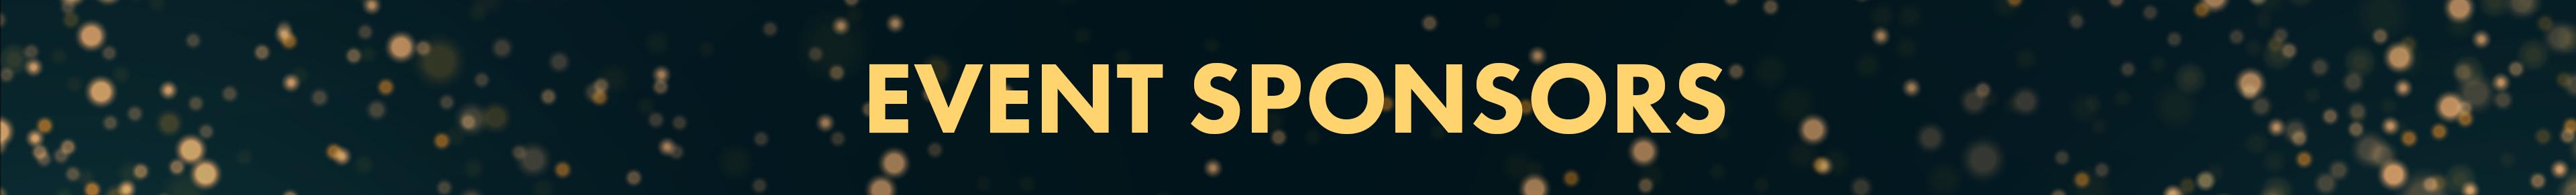 SPONSORS 2